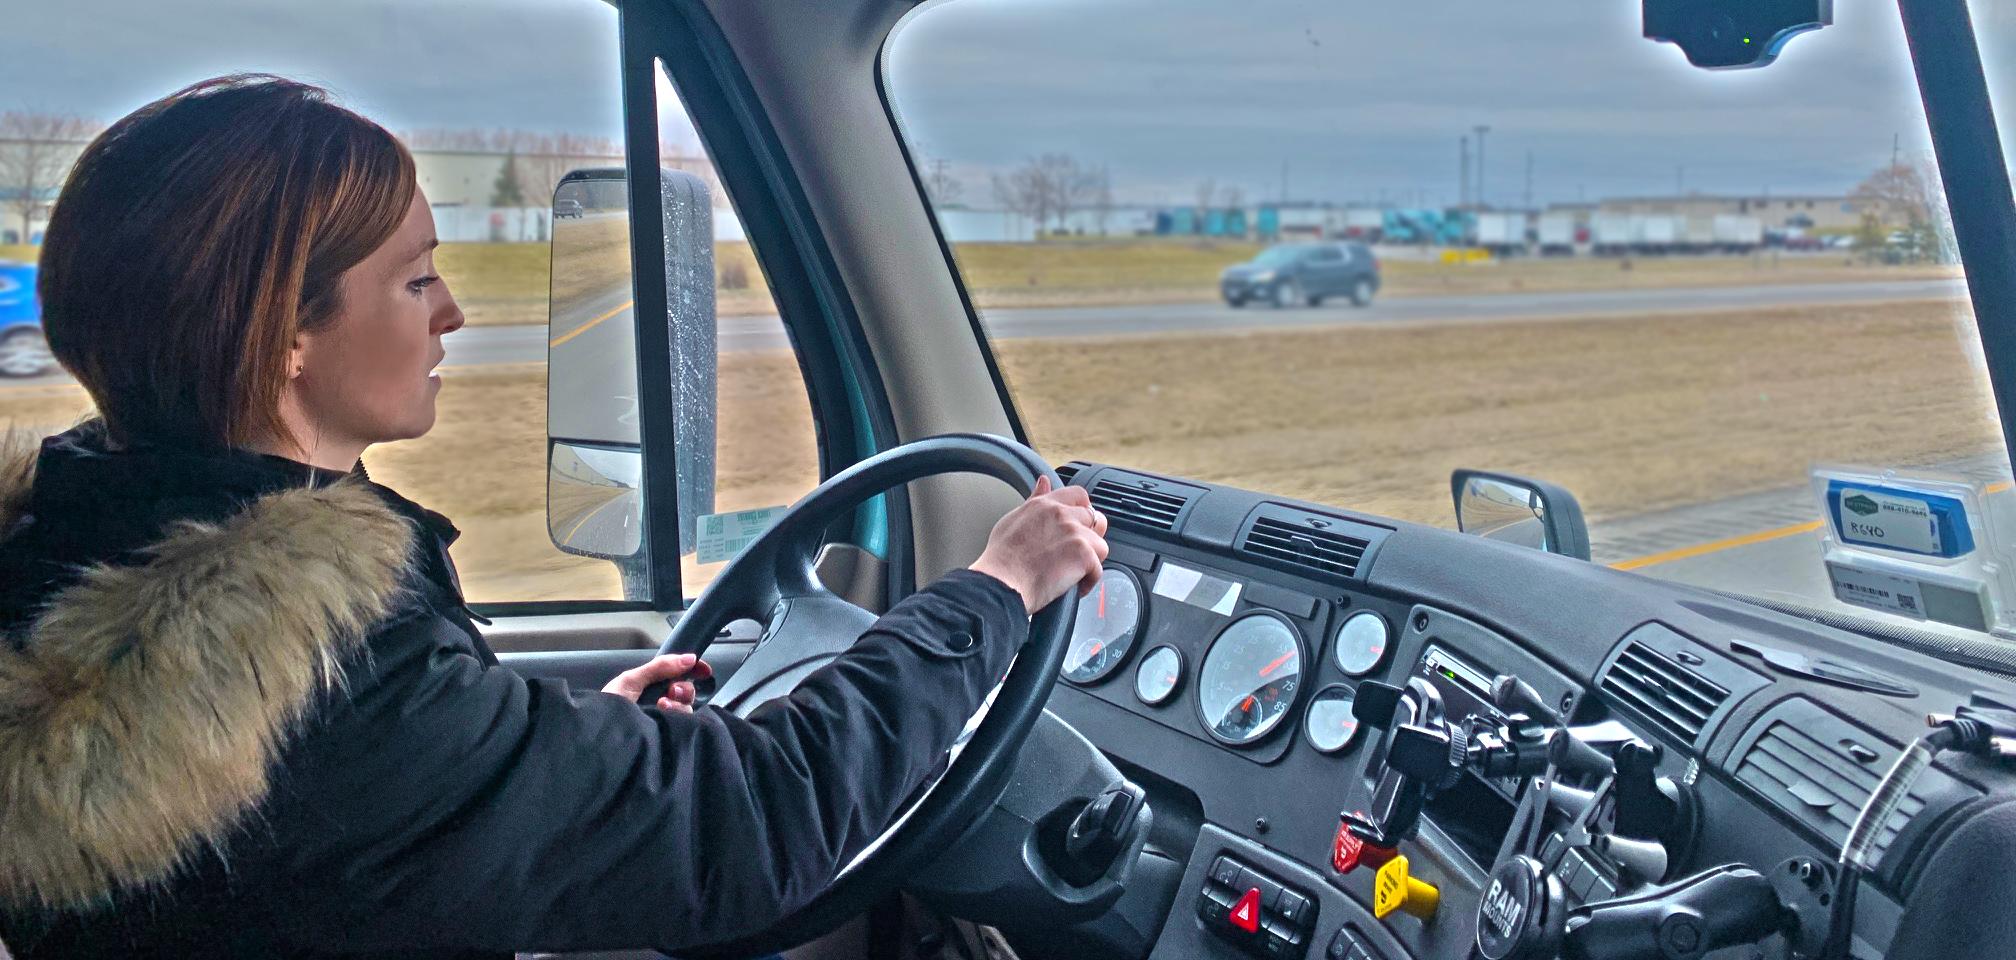 CDL Holder and Keller Trucking Driver Development Coordinator Sarah Cates